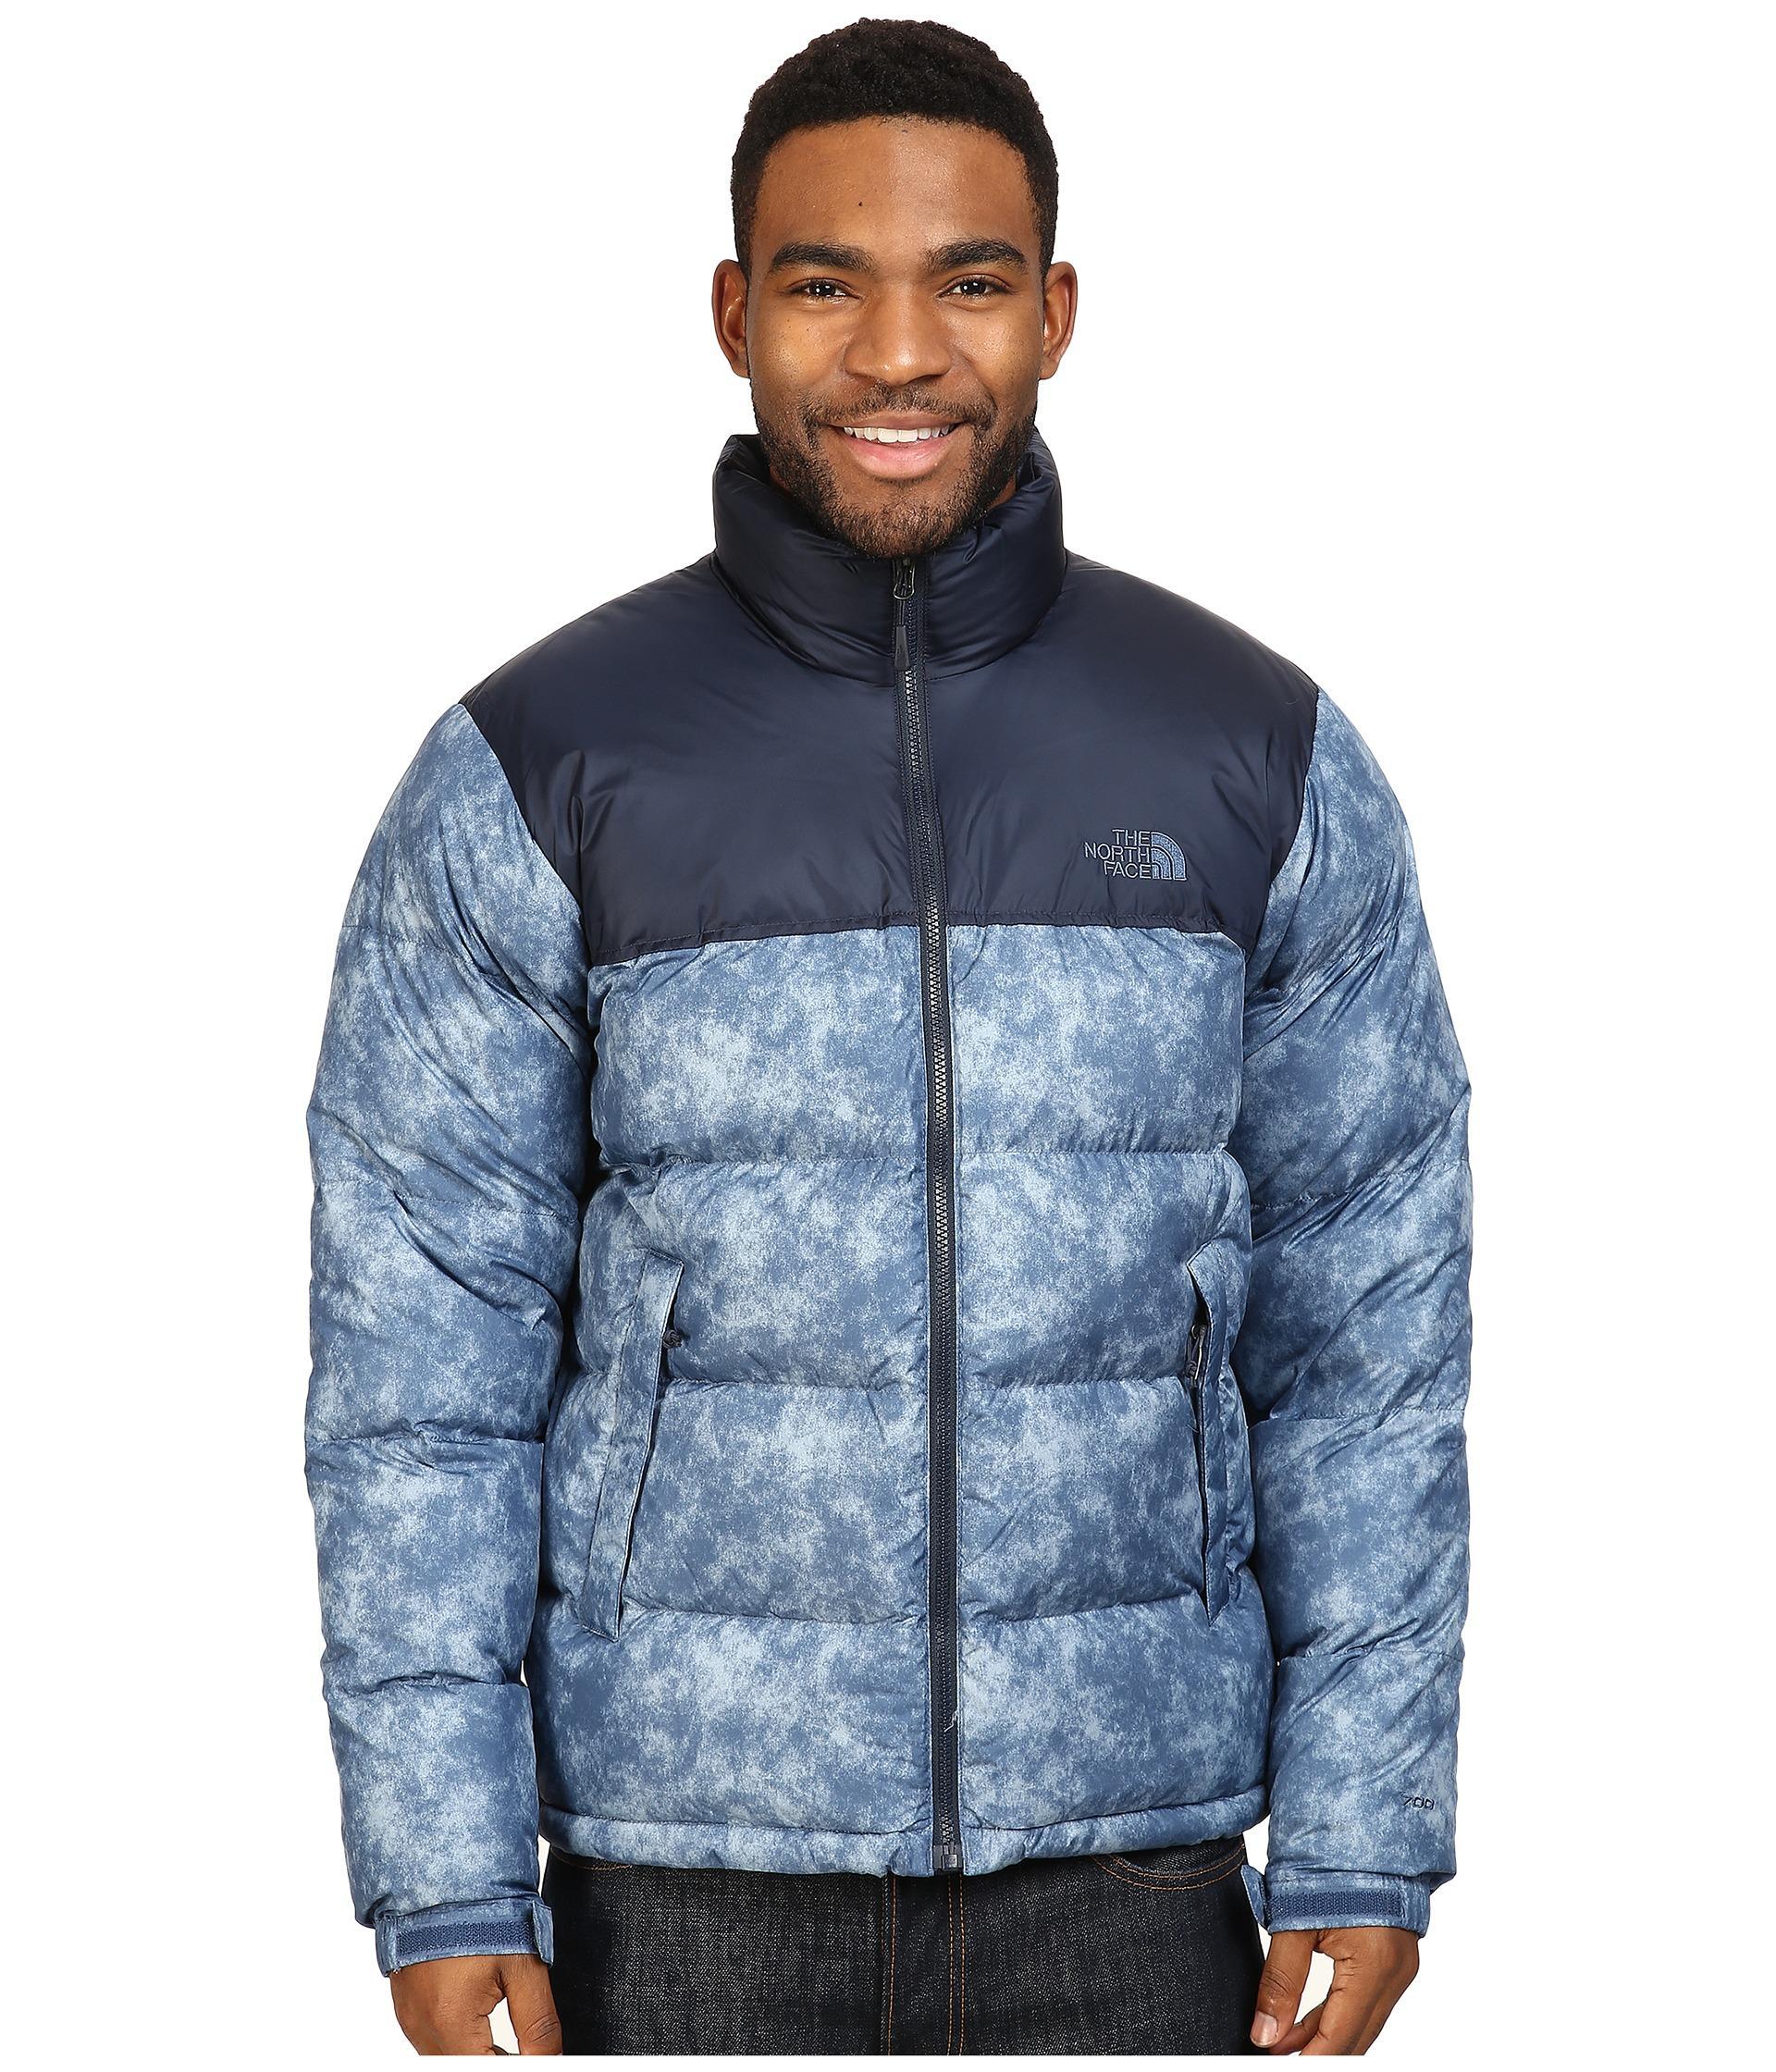 the north face nuptse jacket in blue for men lyst. Black Bedroom Furniture Sets. Home Design Ideas